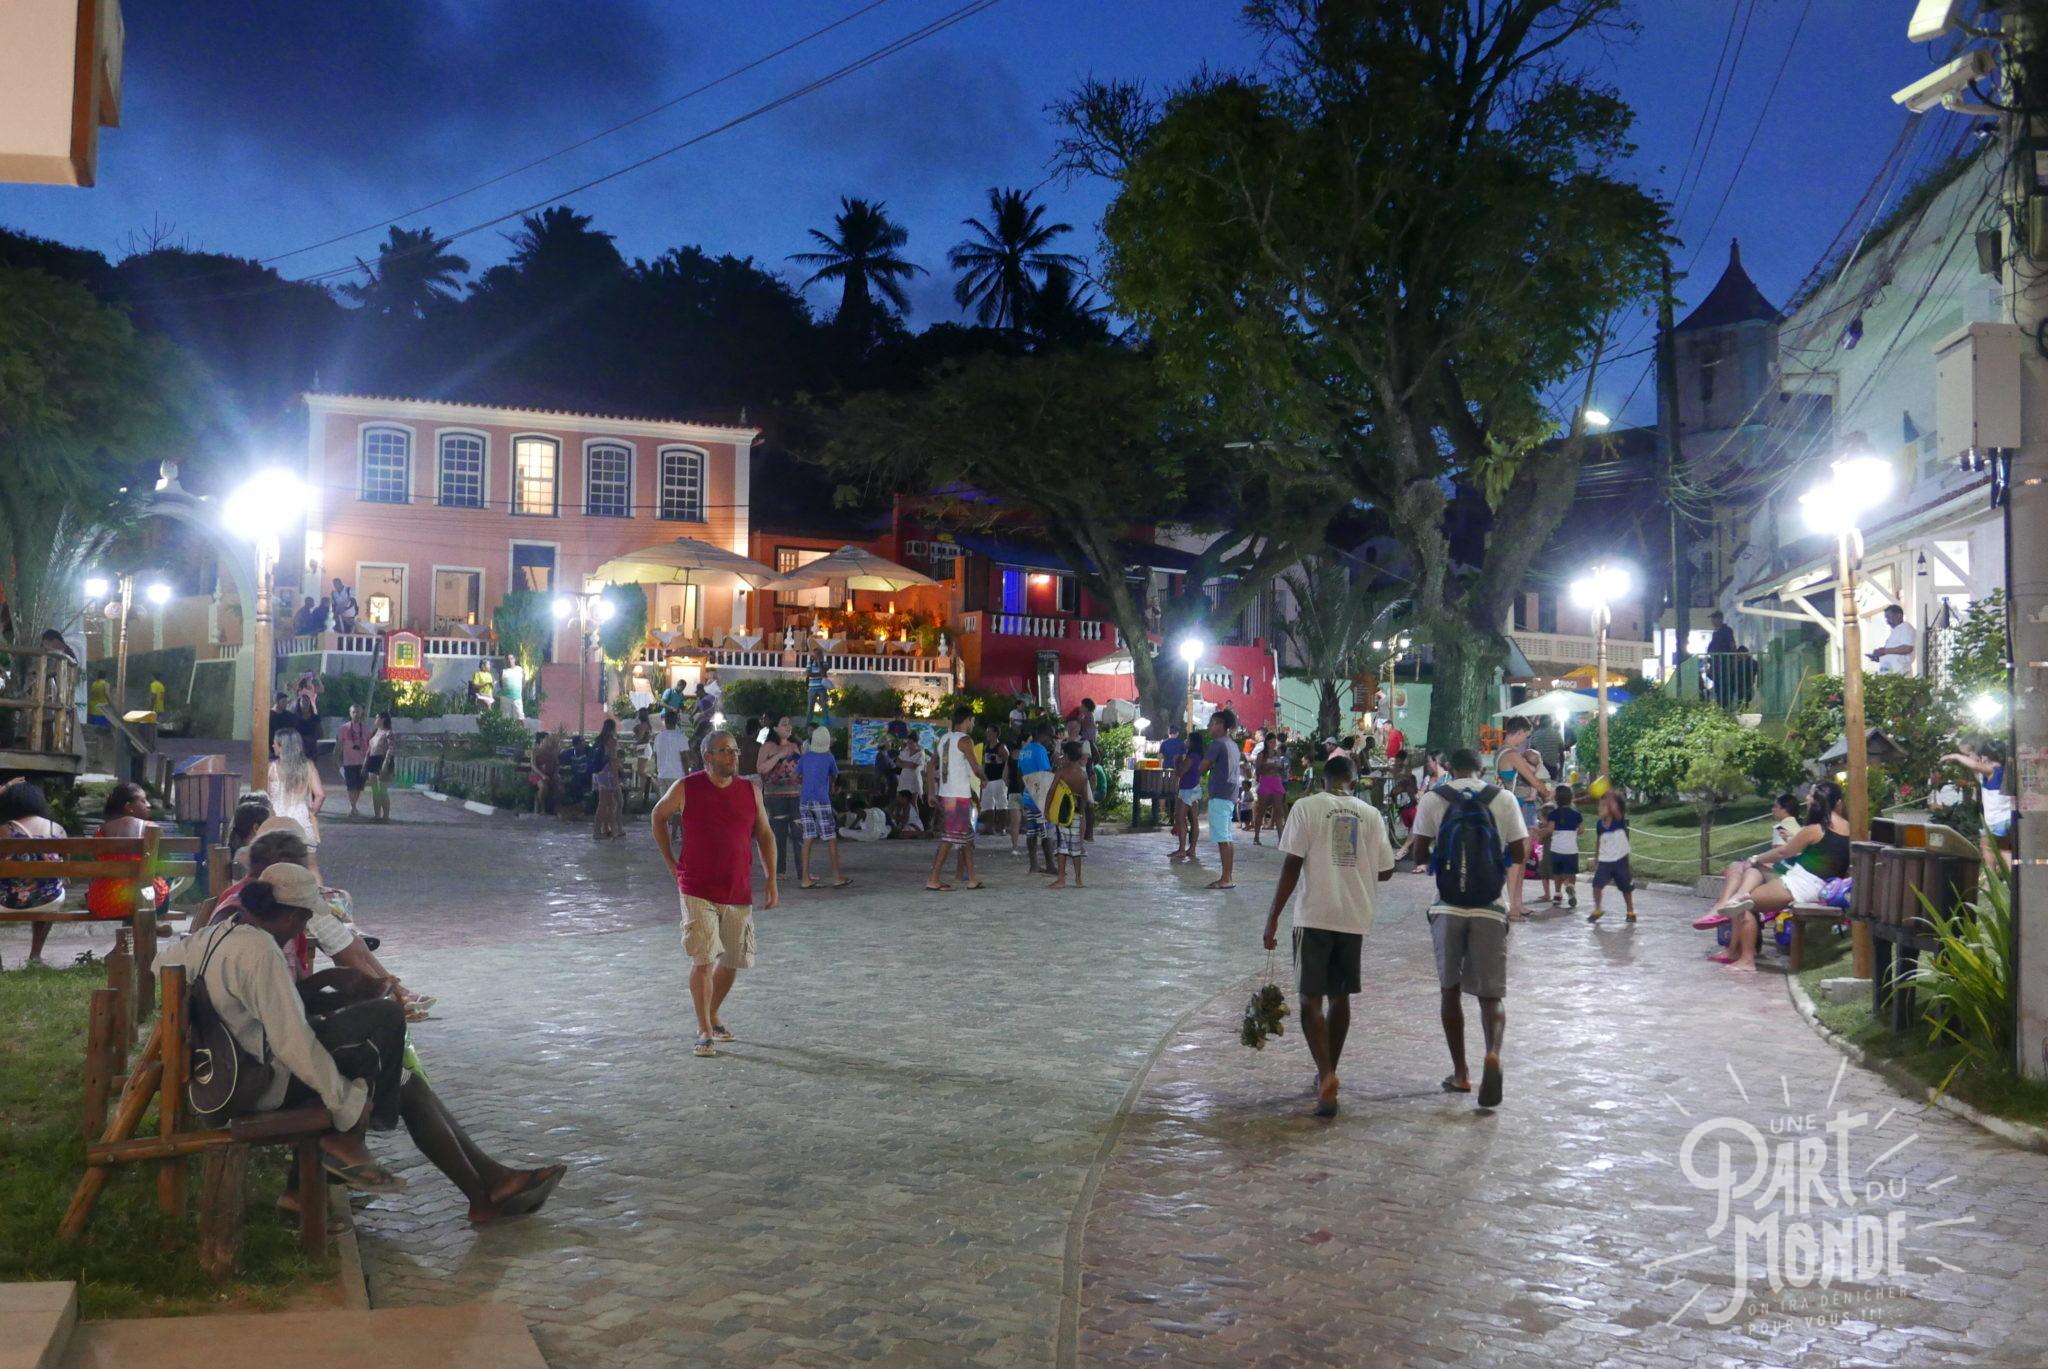 île de tinharé place centrale morro de sao paulo